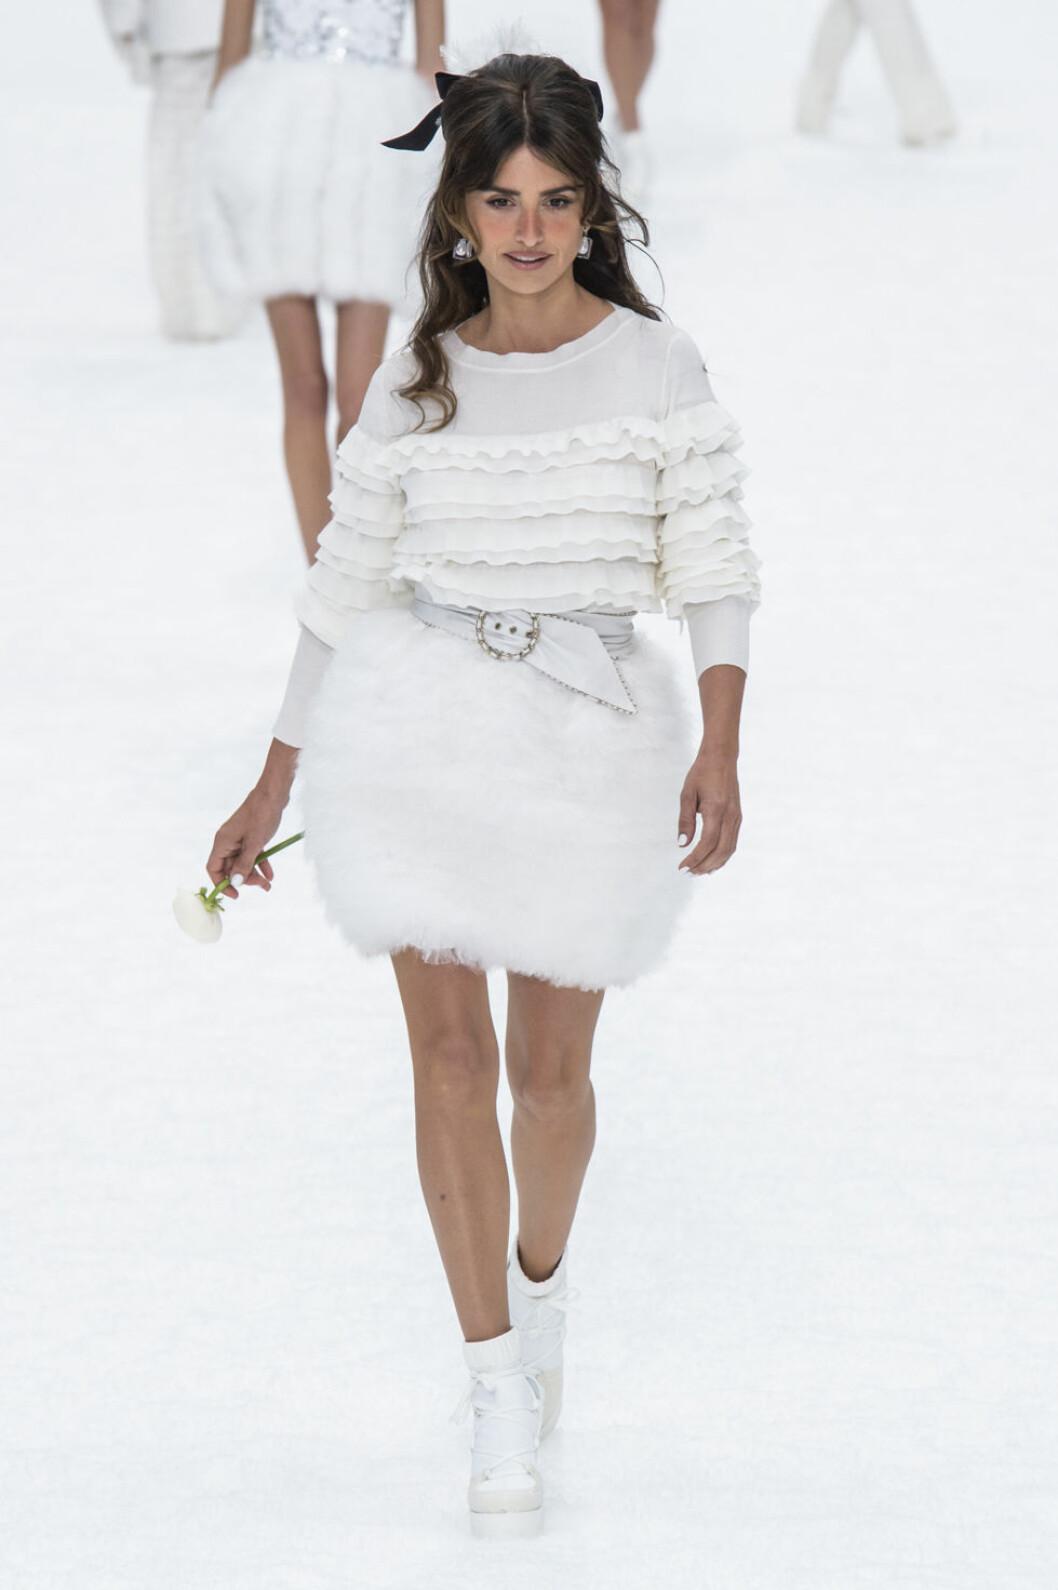 Chanel aw 19 Penelope Cruz